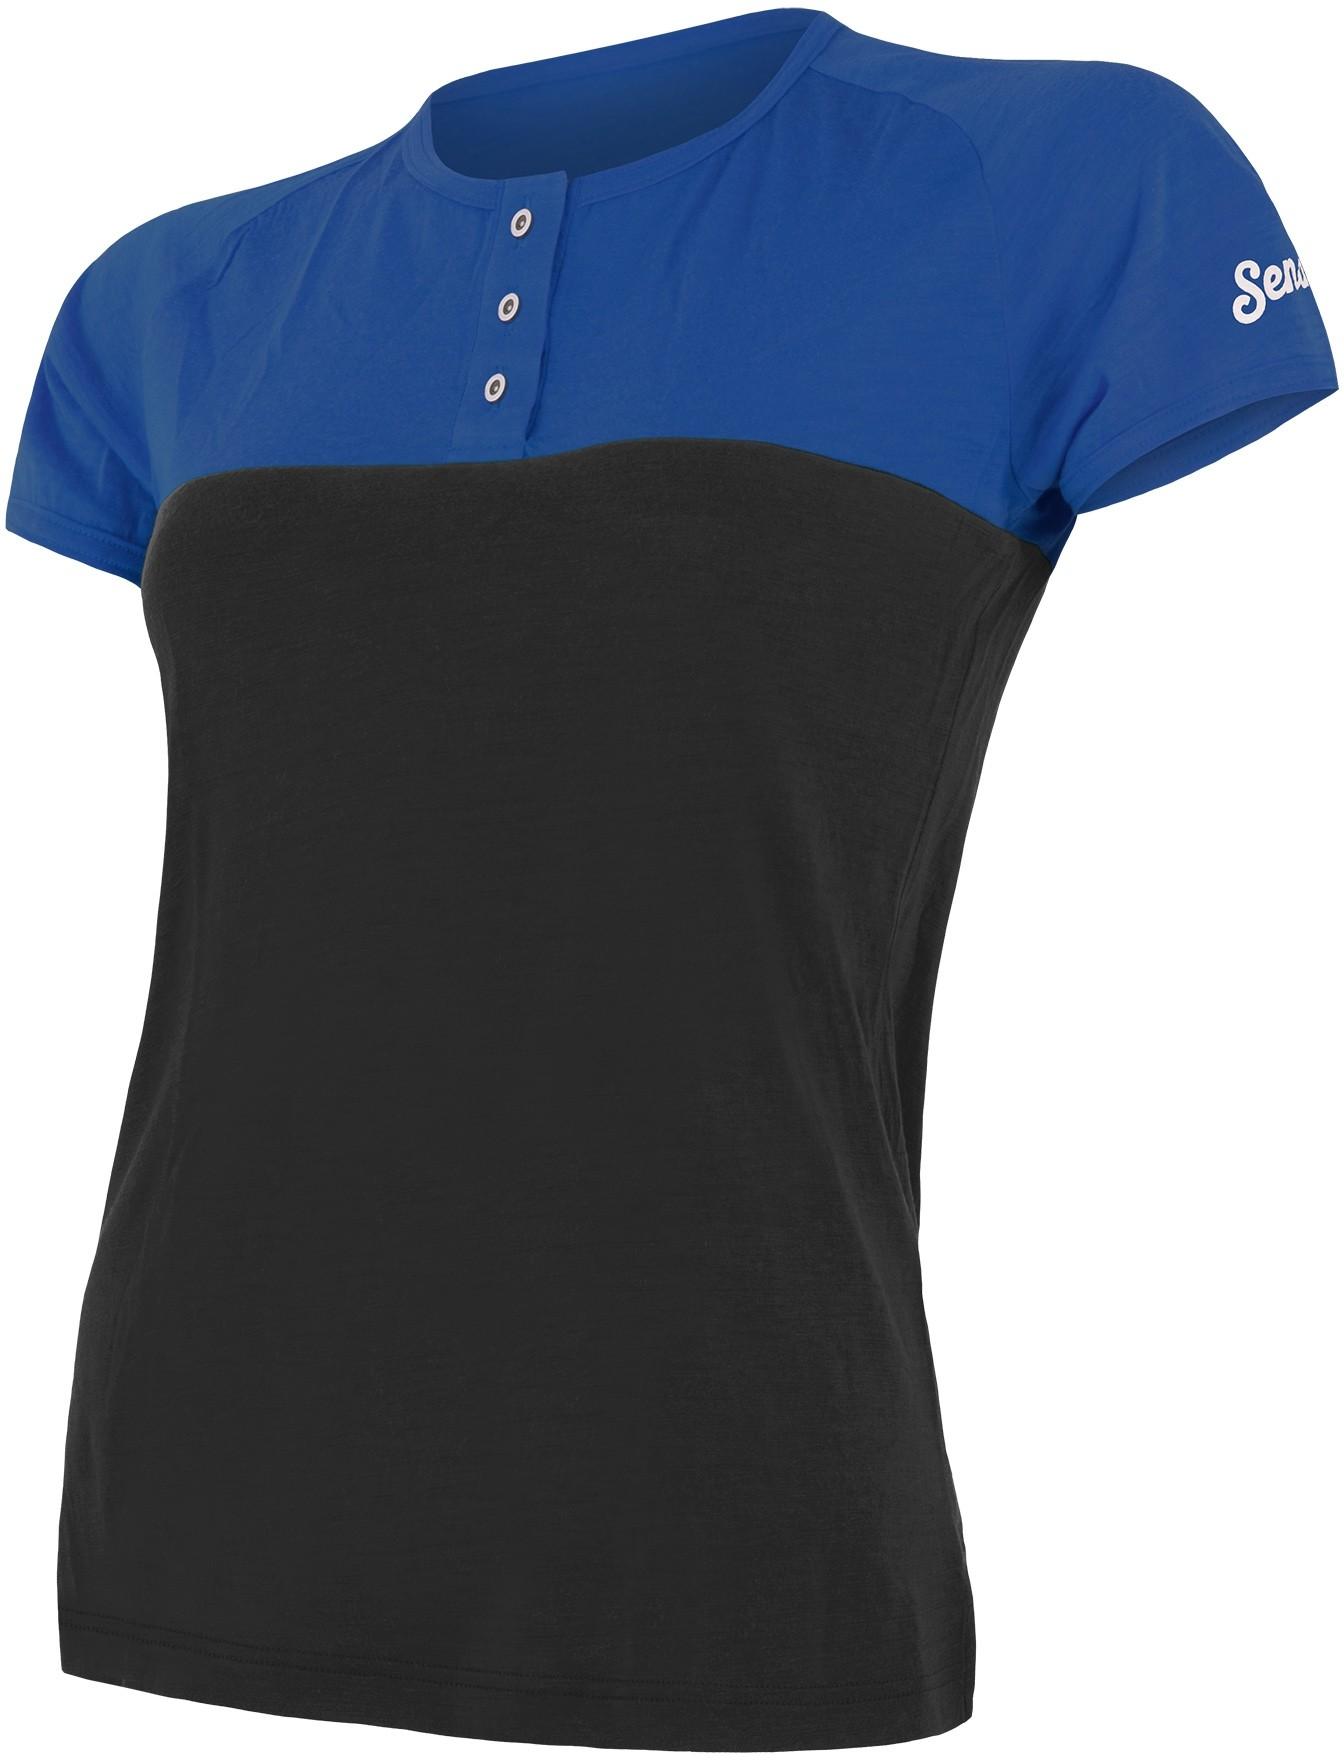 Sensor t shirt damski z guzikami Merino Air PT niebiesko czarny XL